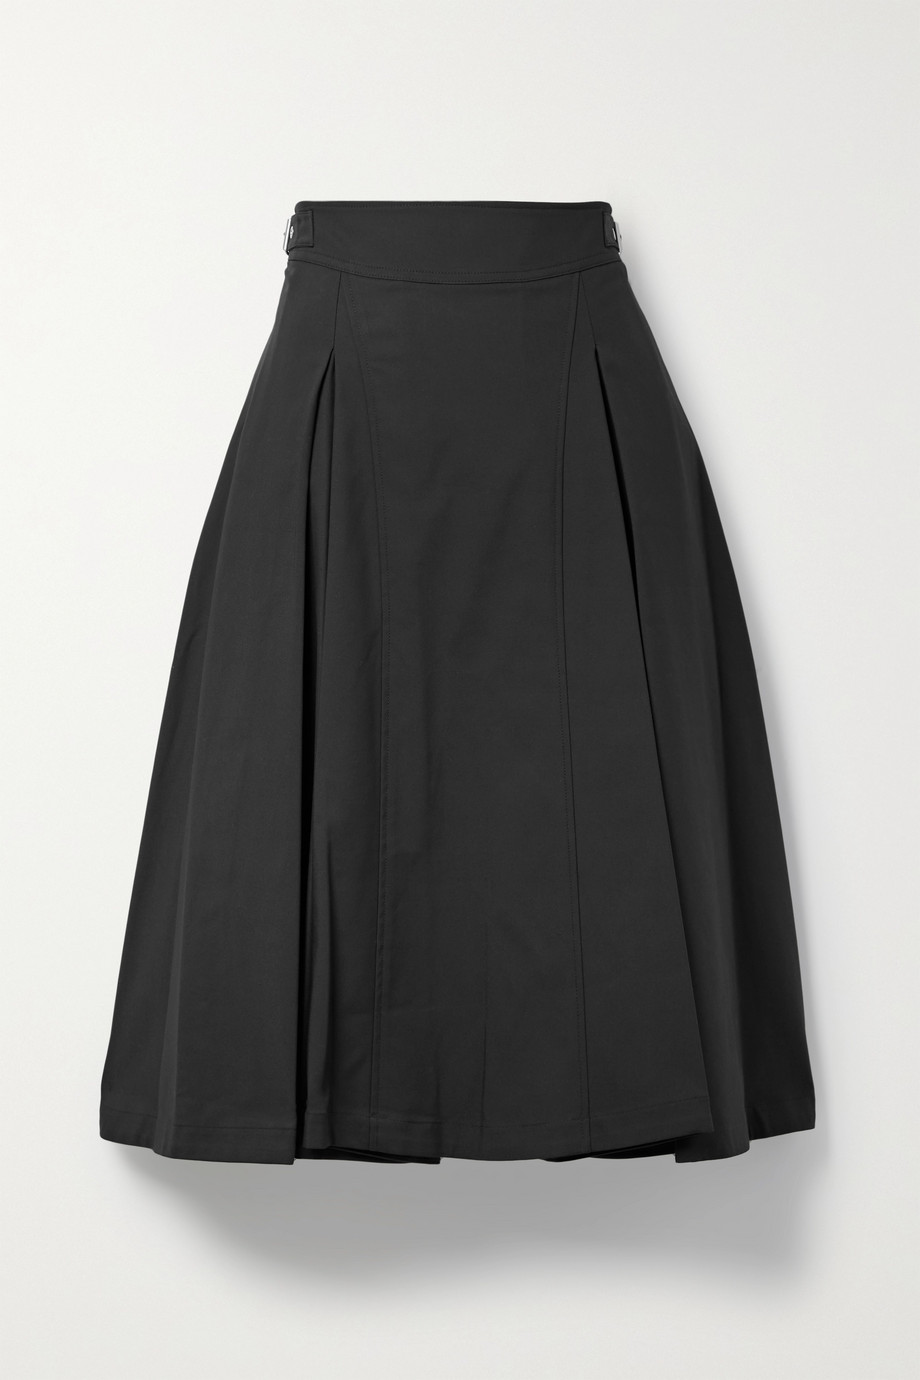 3.1 Phillip Lim 搭扣褶裥棉质混纺中长半身裙